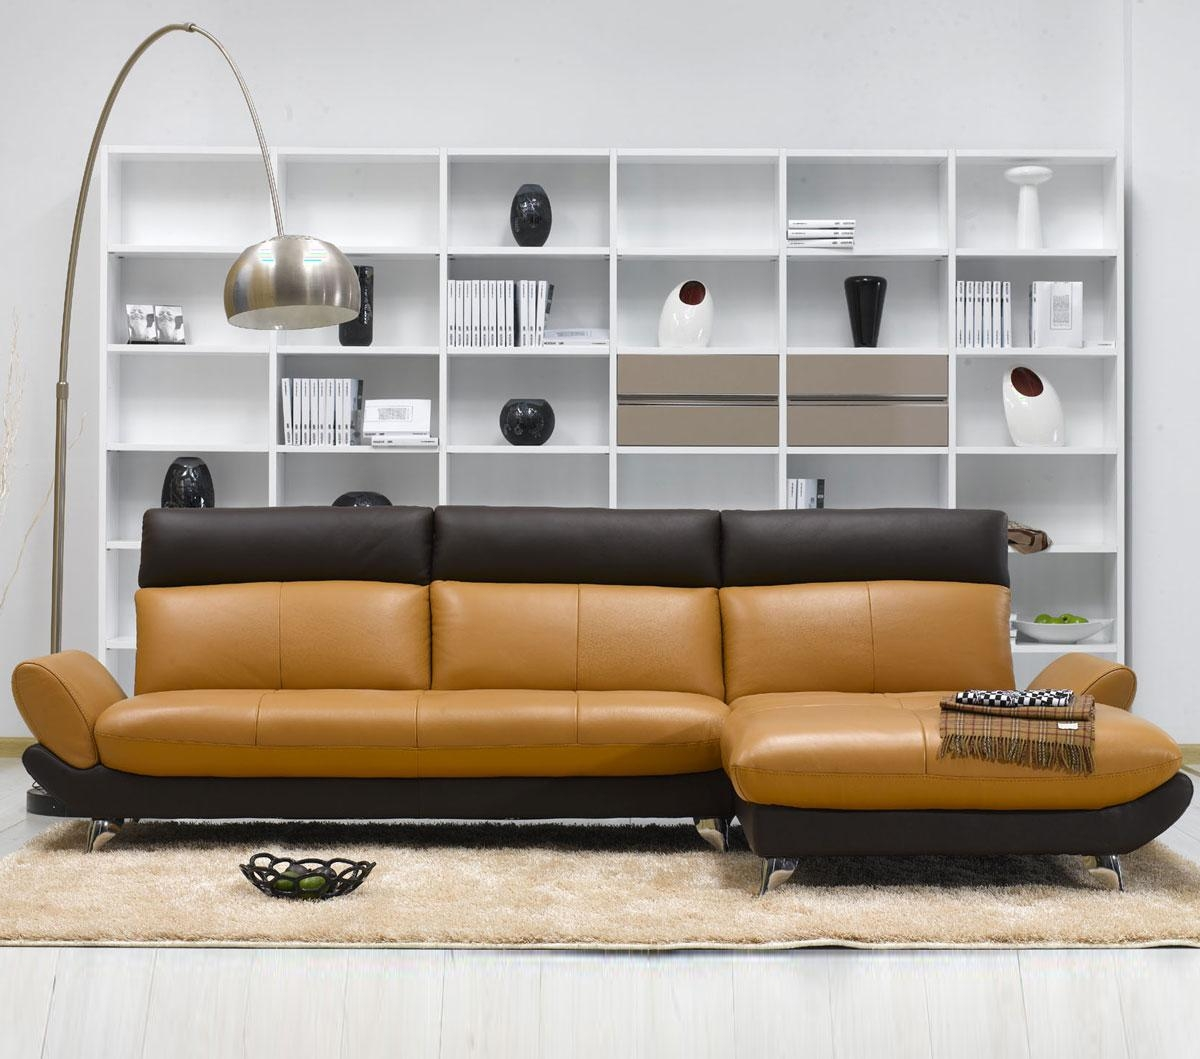 caramel colored leather sofas winston sofa 20 best ideas carmel